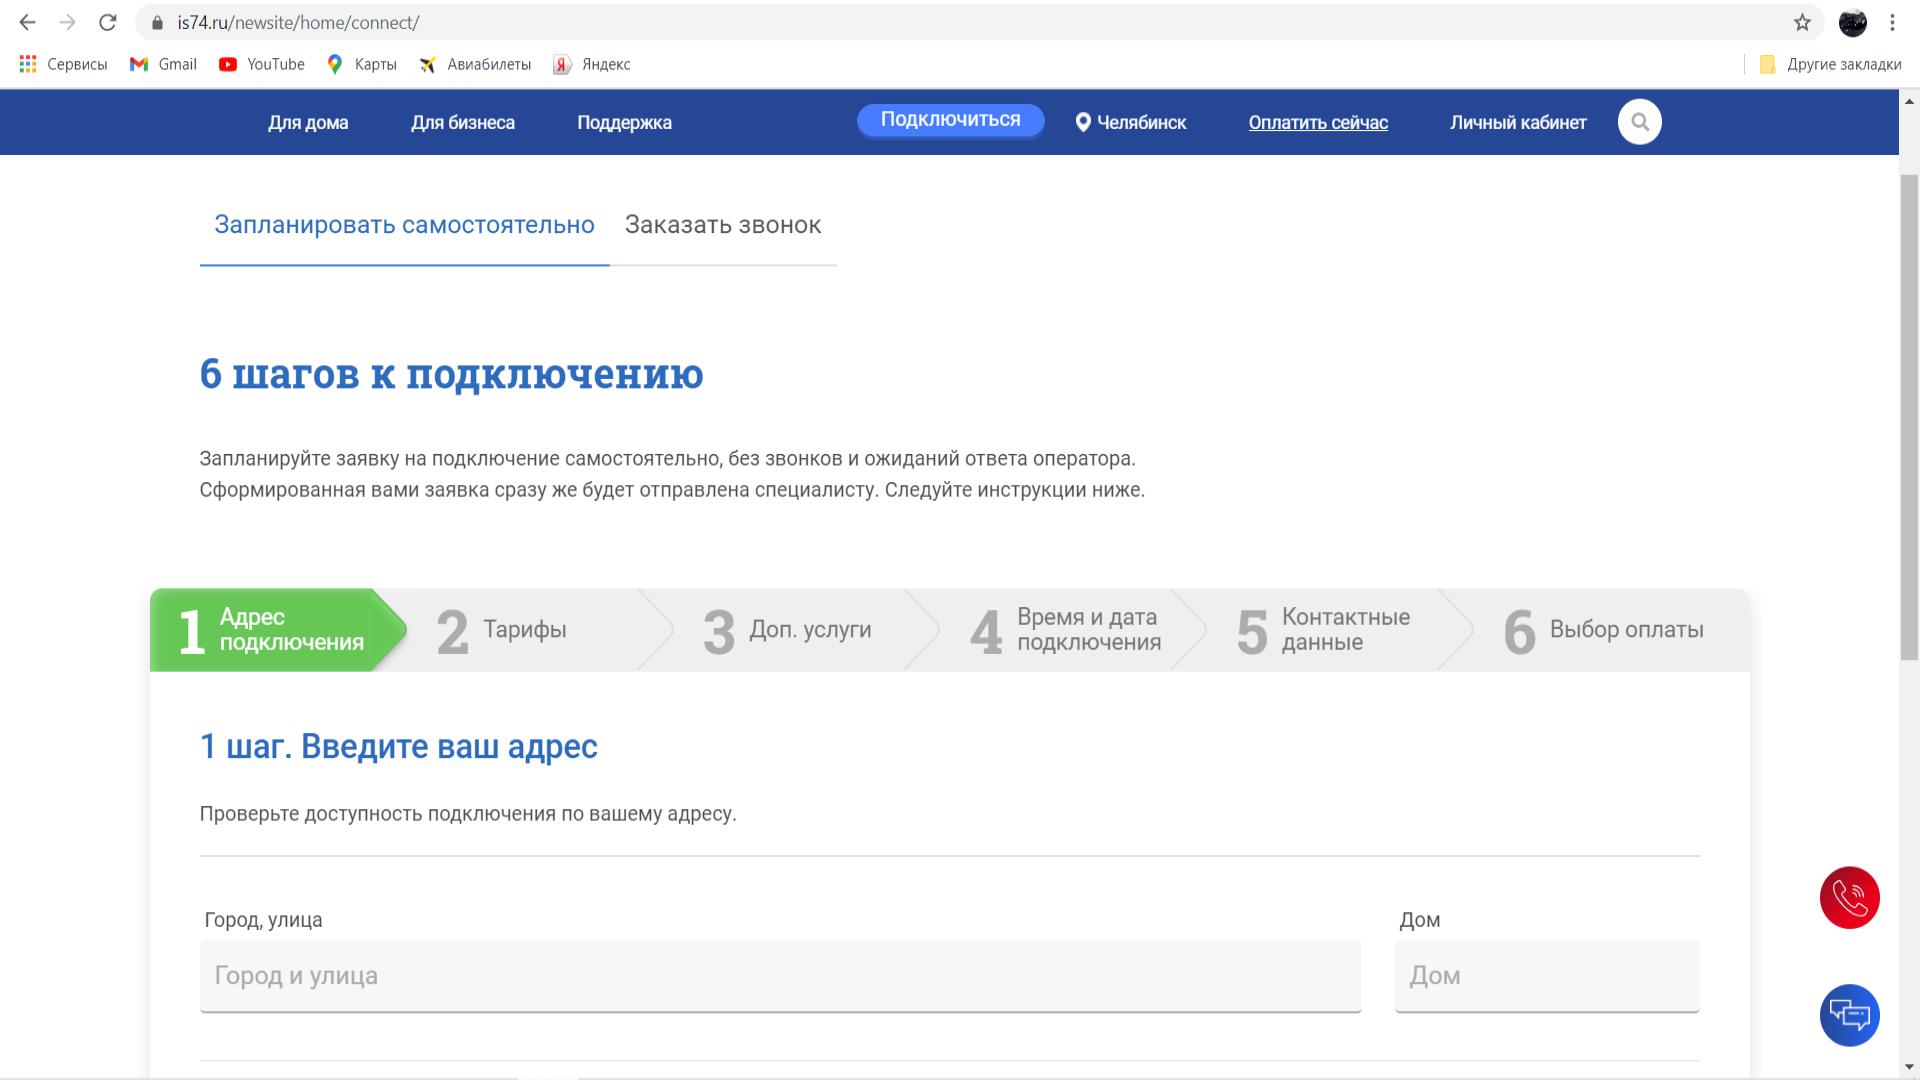 регистрация на сайте интерсвязь